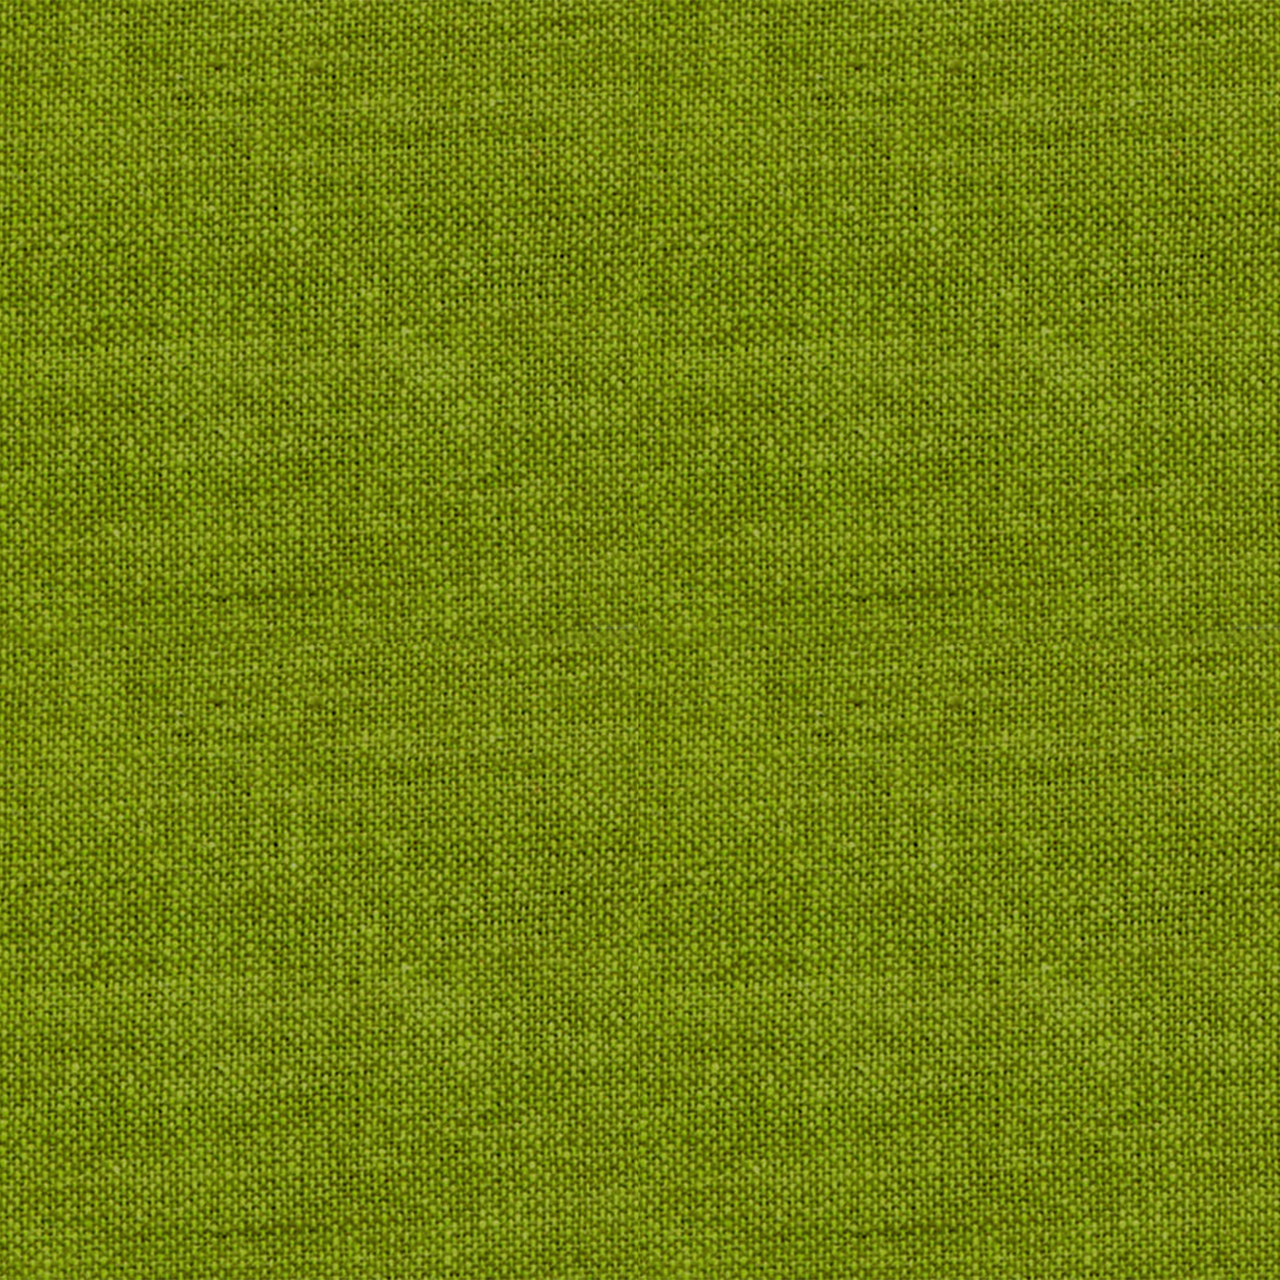 108 x 72 Peppered Cotton Green Tea